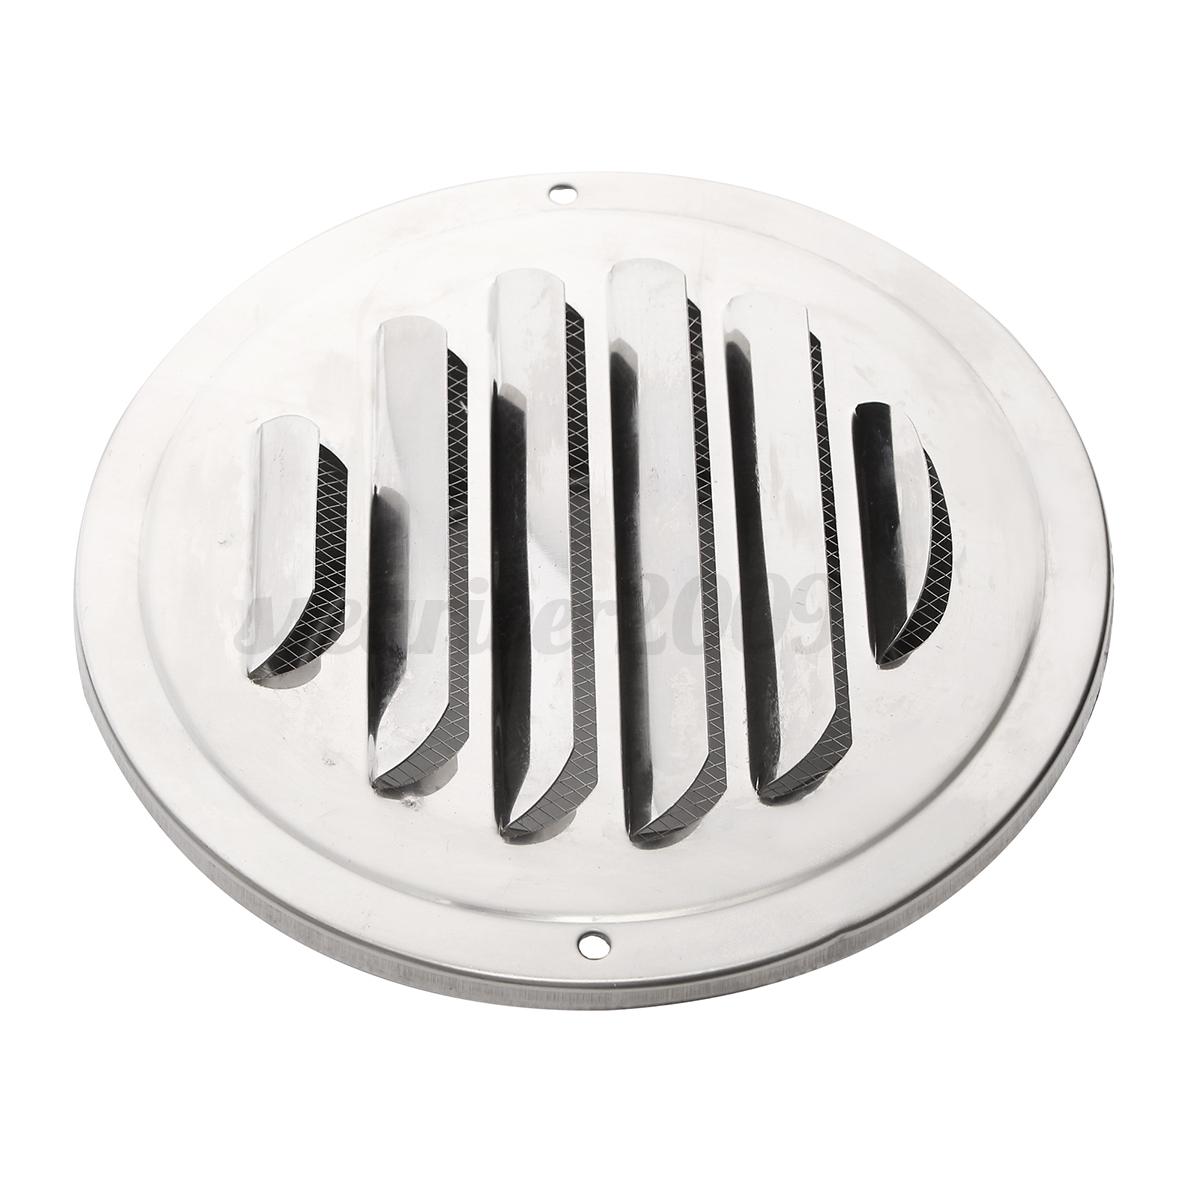 stainless steel circle air vent grille door ventilation. Black Bedroom Furniture Sets. Home Design Ideas